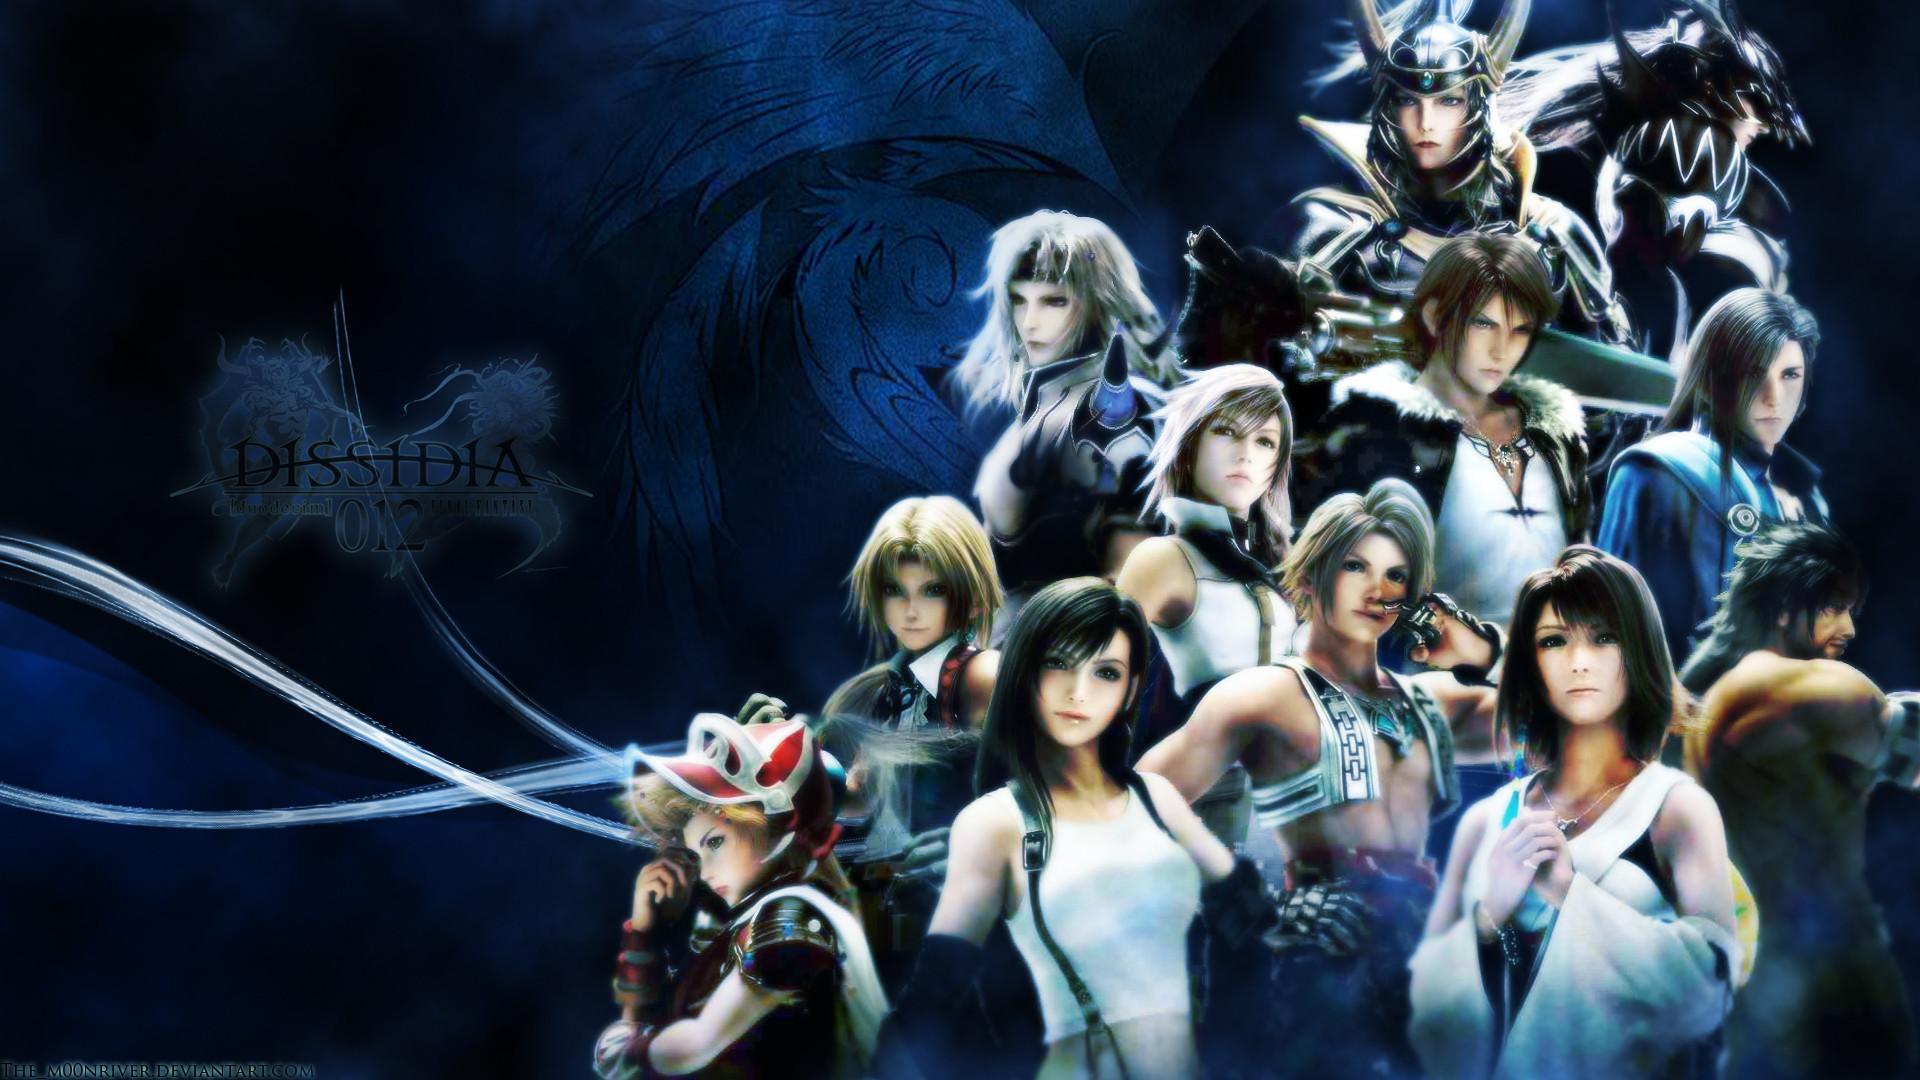 Final Fantasy Viii Wallpaper 1920x1080